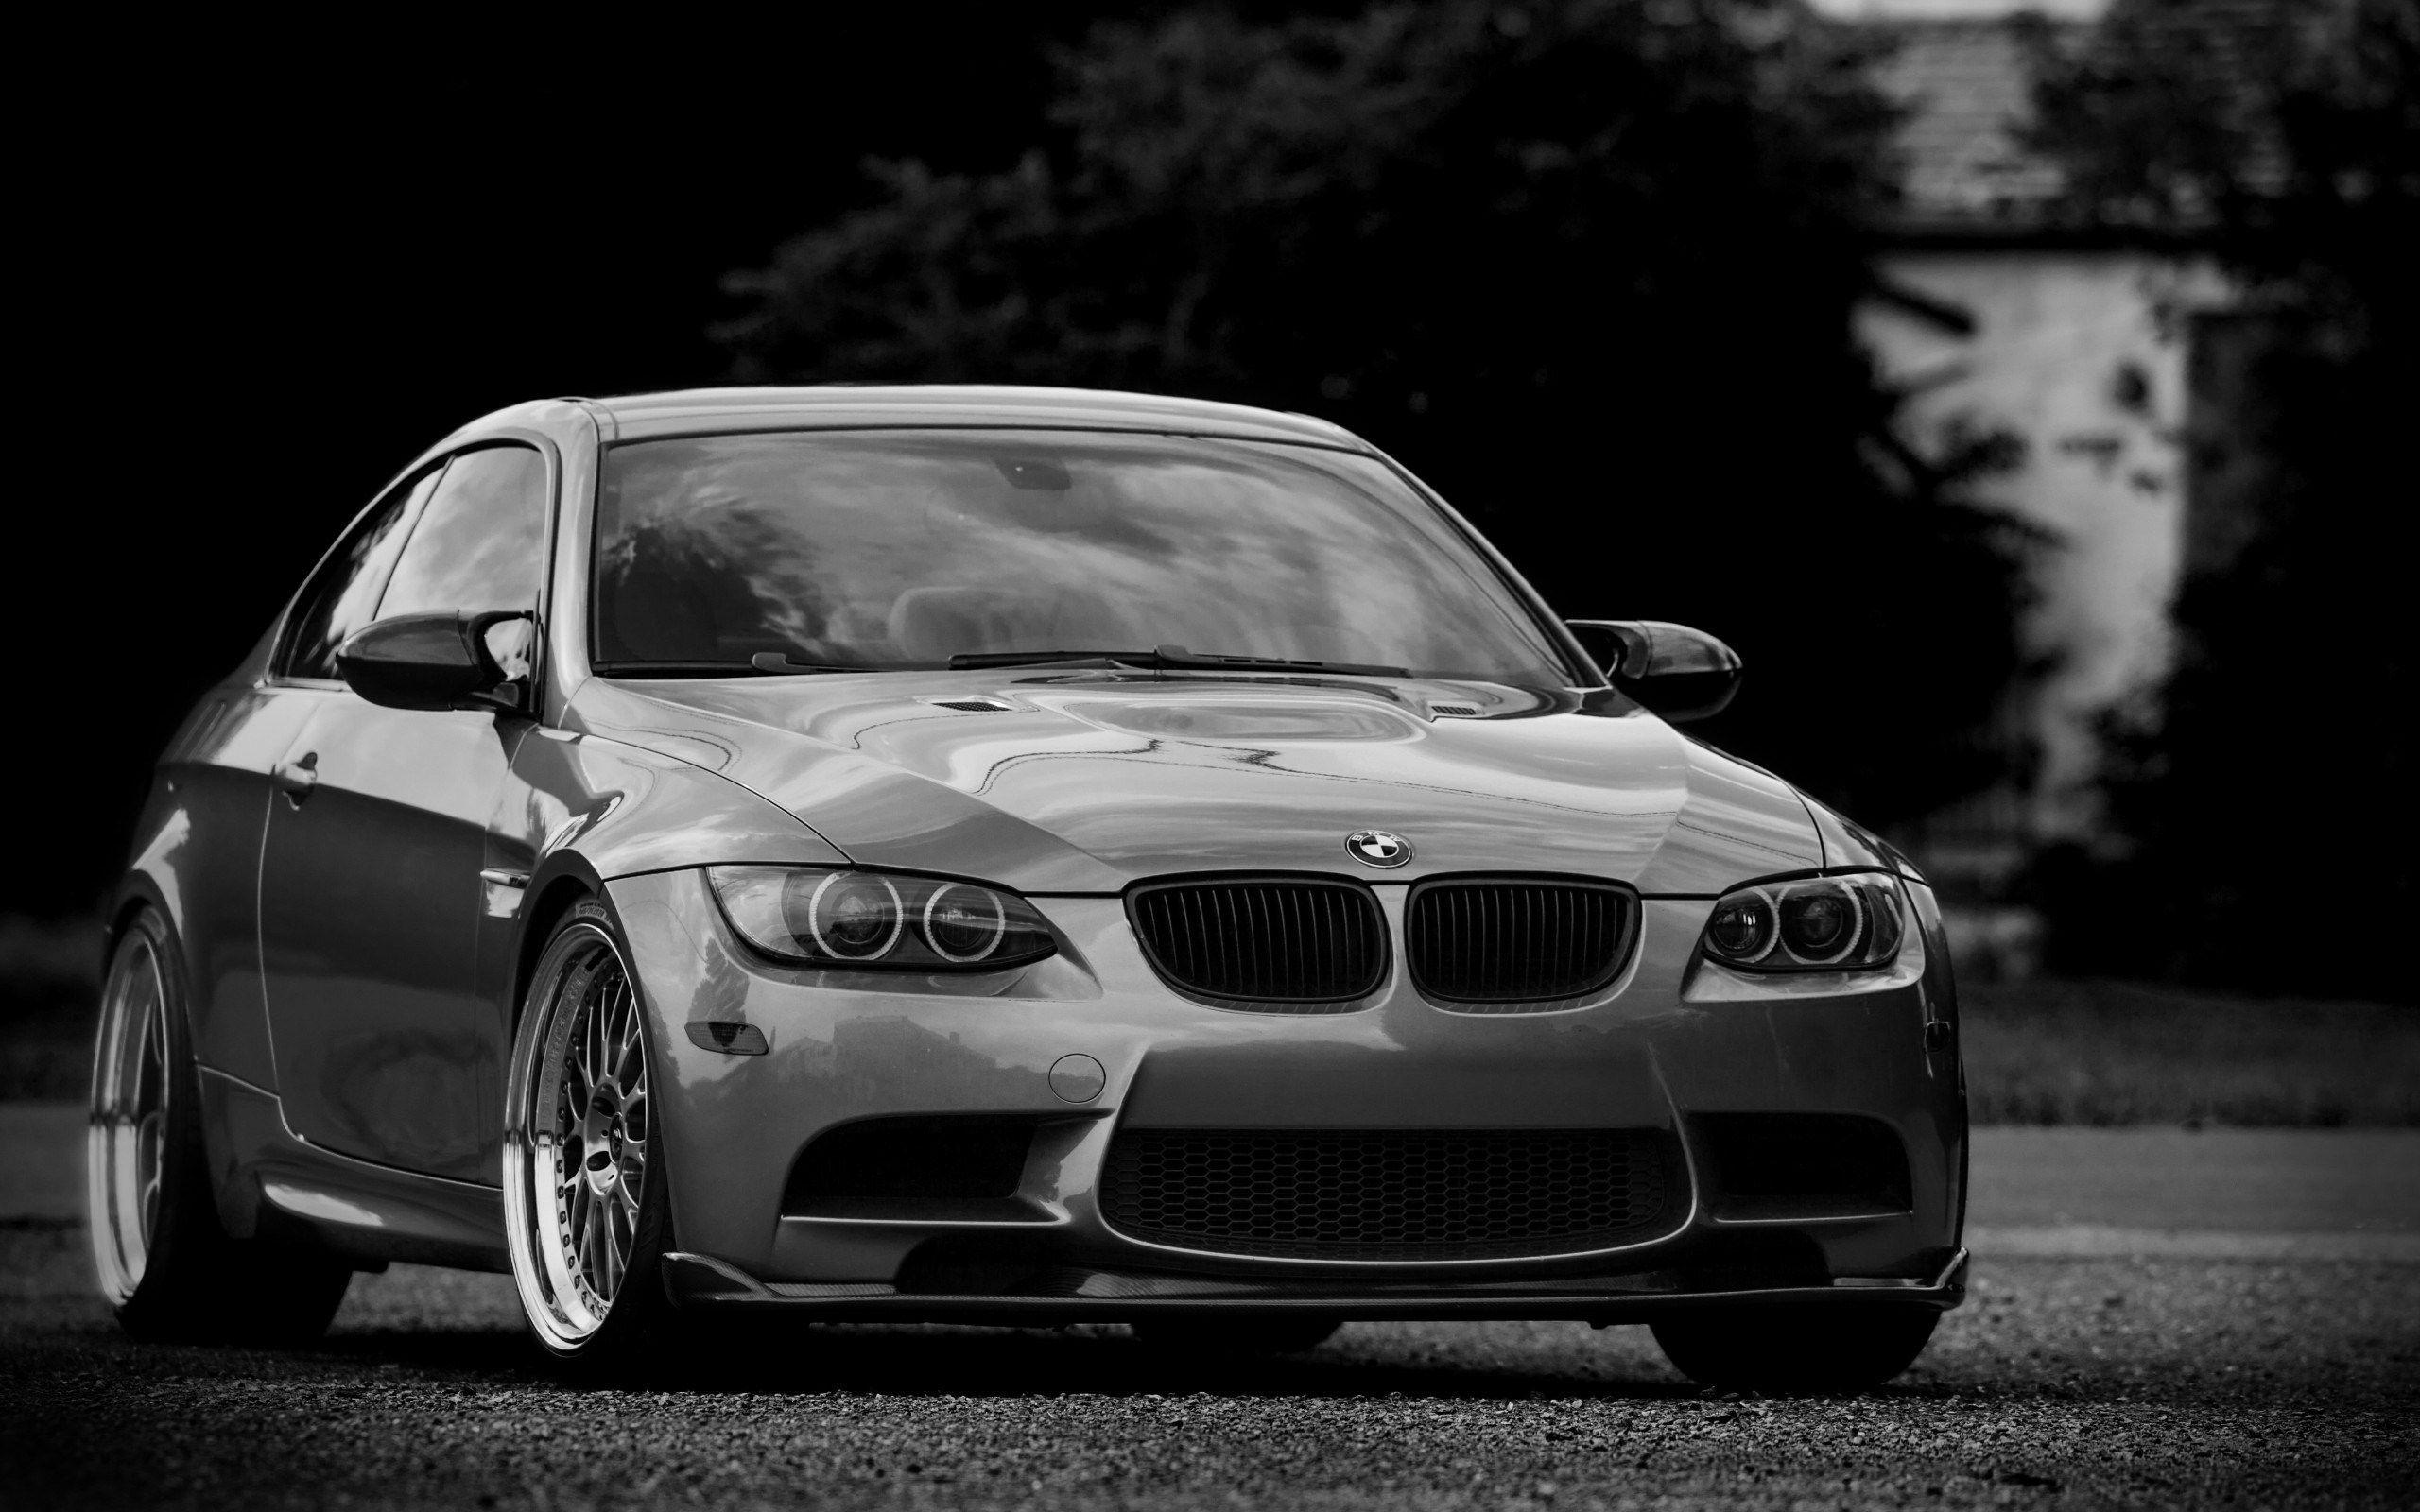 Bmw M3 E92 White BMW White Coupe Rear View Lights Reflection ... | Download  Wallpaper | Pinterest | Rear View And Wallpaper